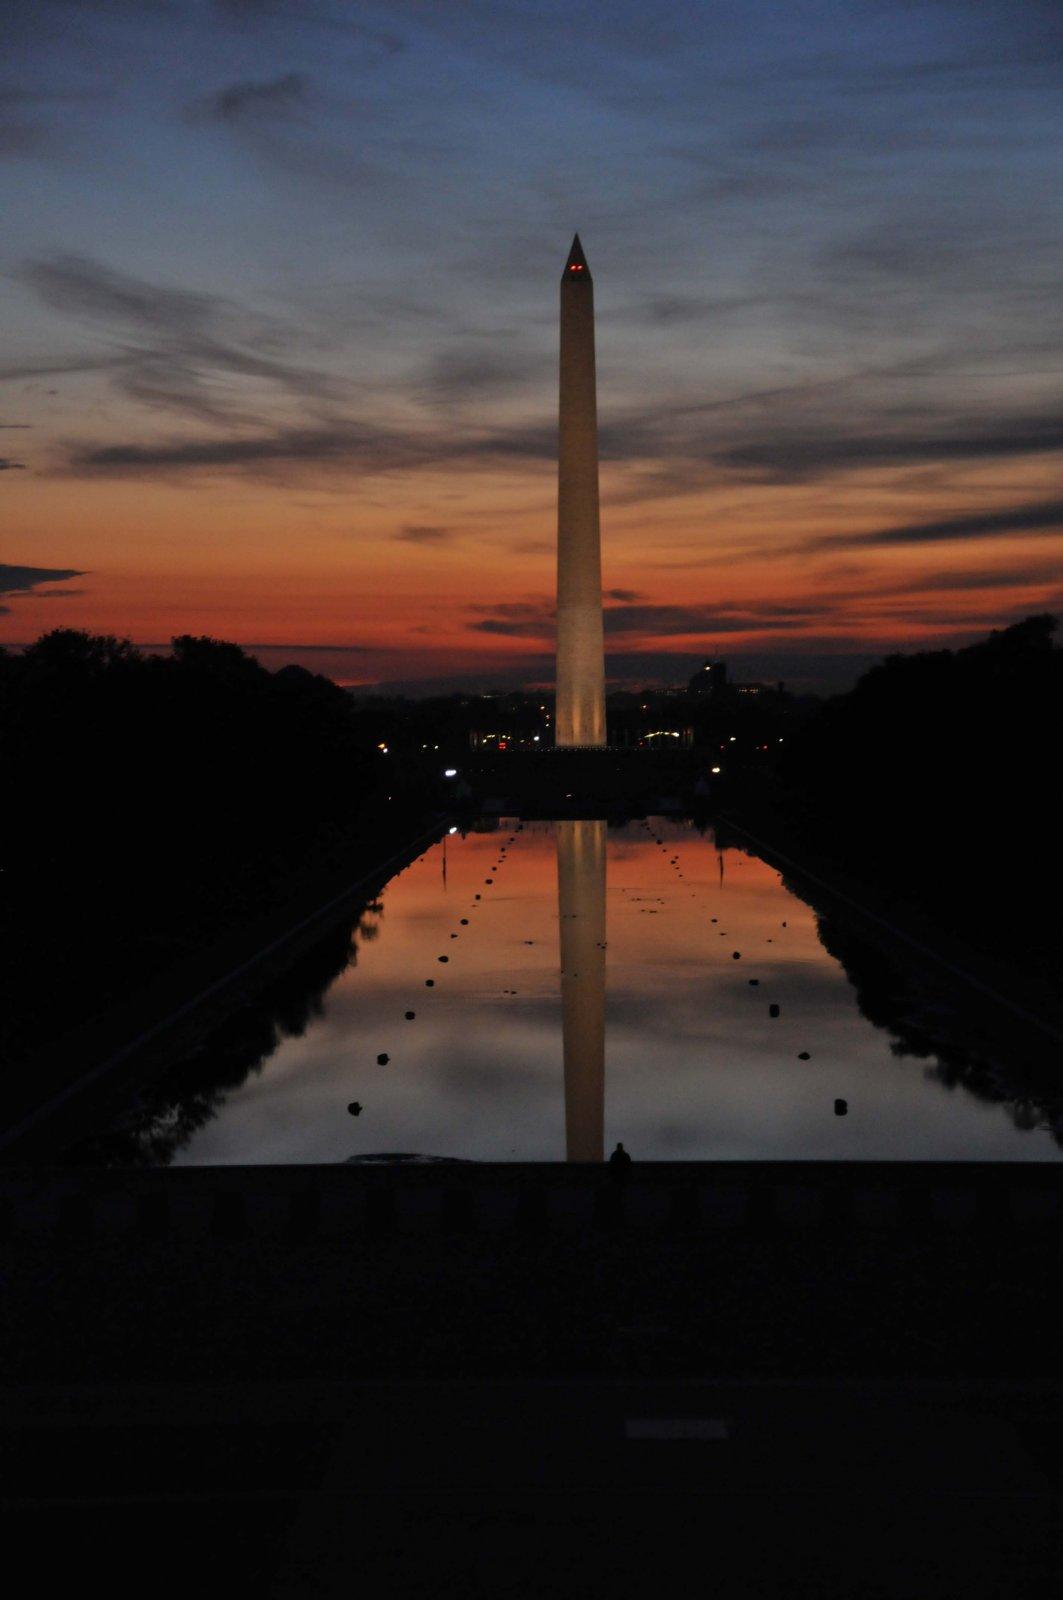 Click image for larger version  Name:Washington-5-a.jpg Views:64 Size:101.3 KB ID:150405